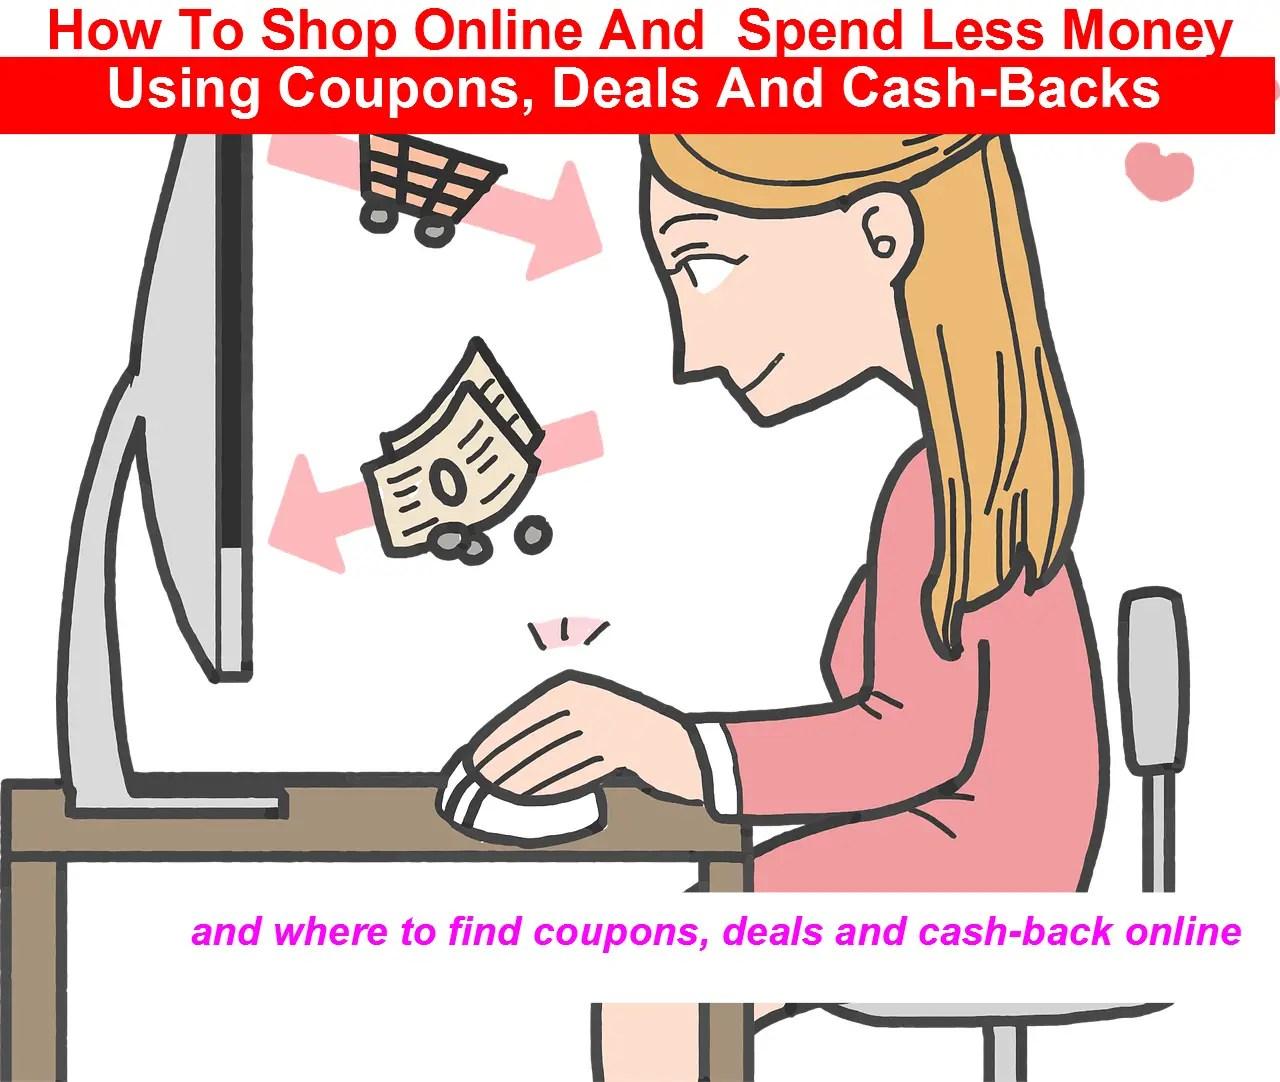 internet deals coupons cash back